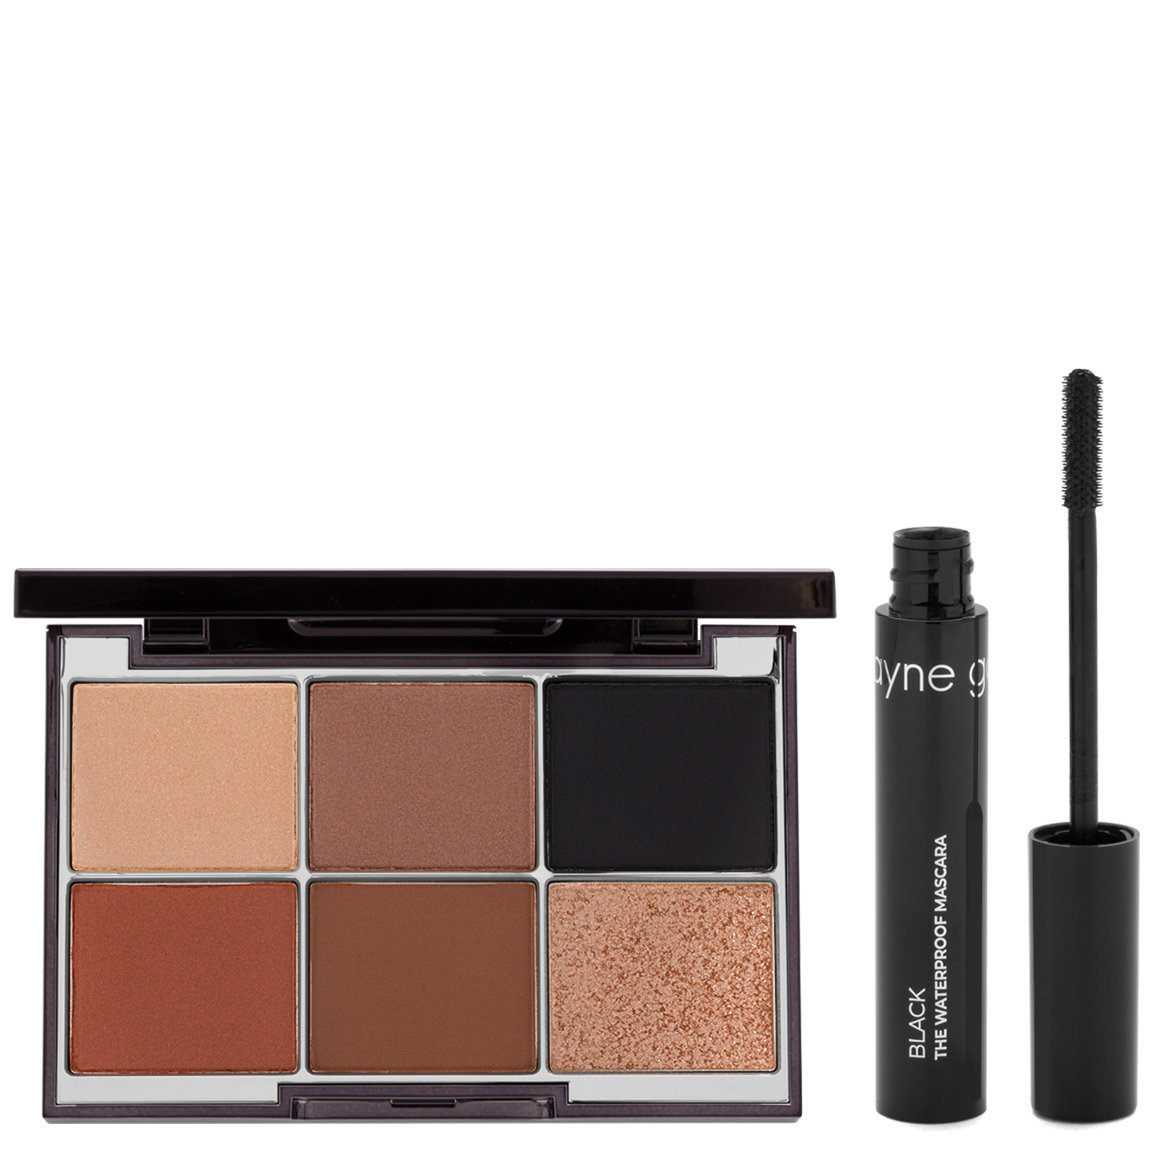 Wayne Goss Imperial Topaz Luxury Eye Palette + Waterproof Mascara alternative view 1 - product swatch.